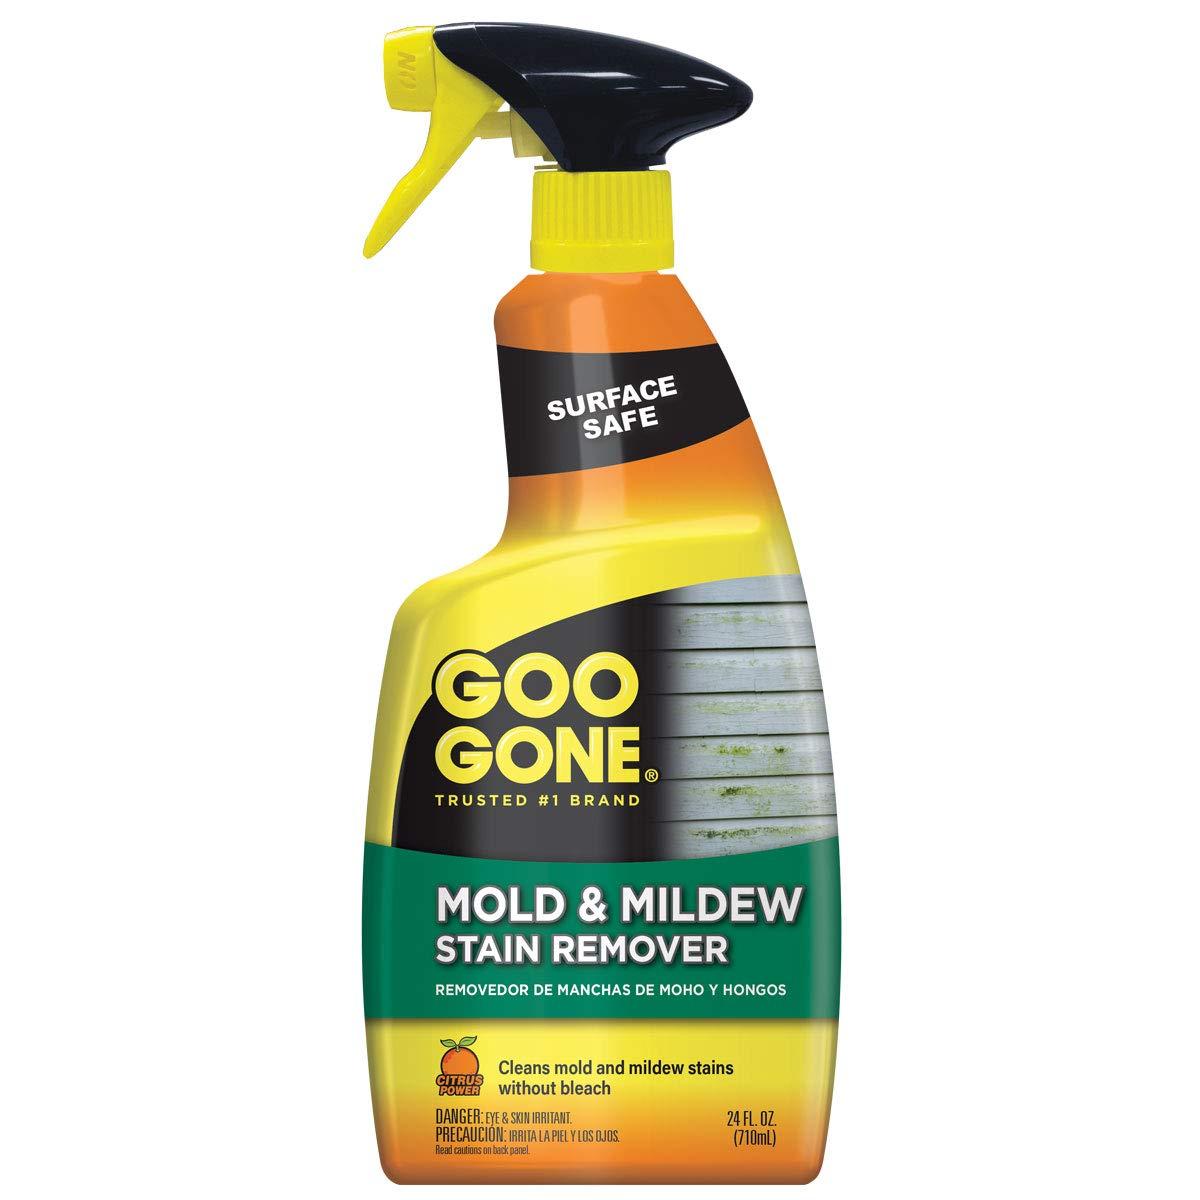 Goo gone mold mildew stain remover 24 fl oz amazon com